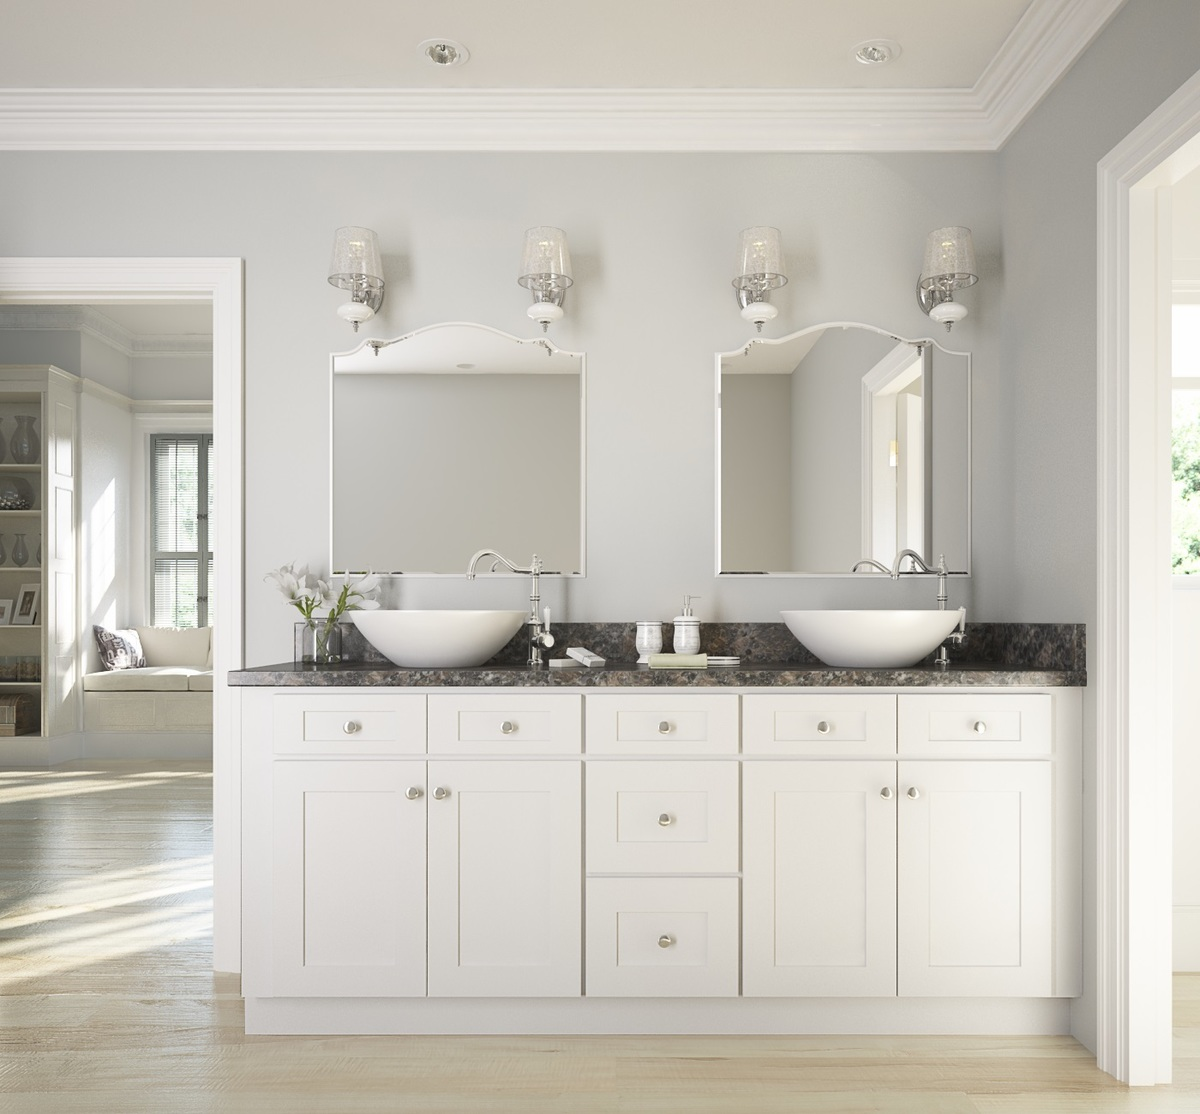 bathroom cabinets brilliant white shaker rta cabinets PIHBHXR